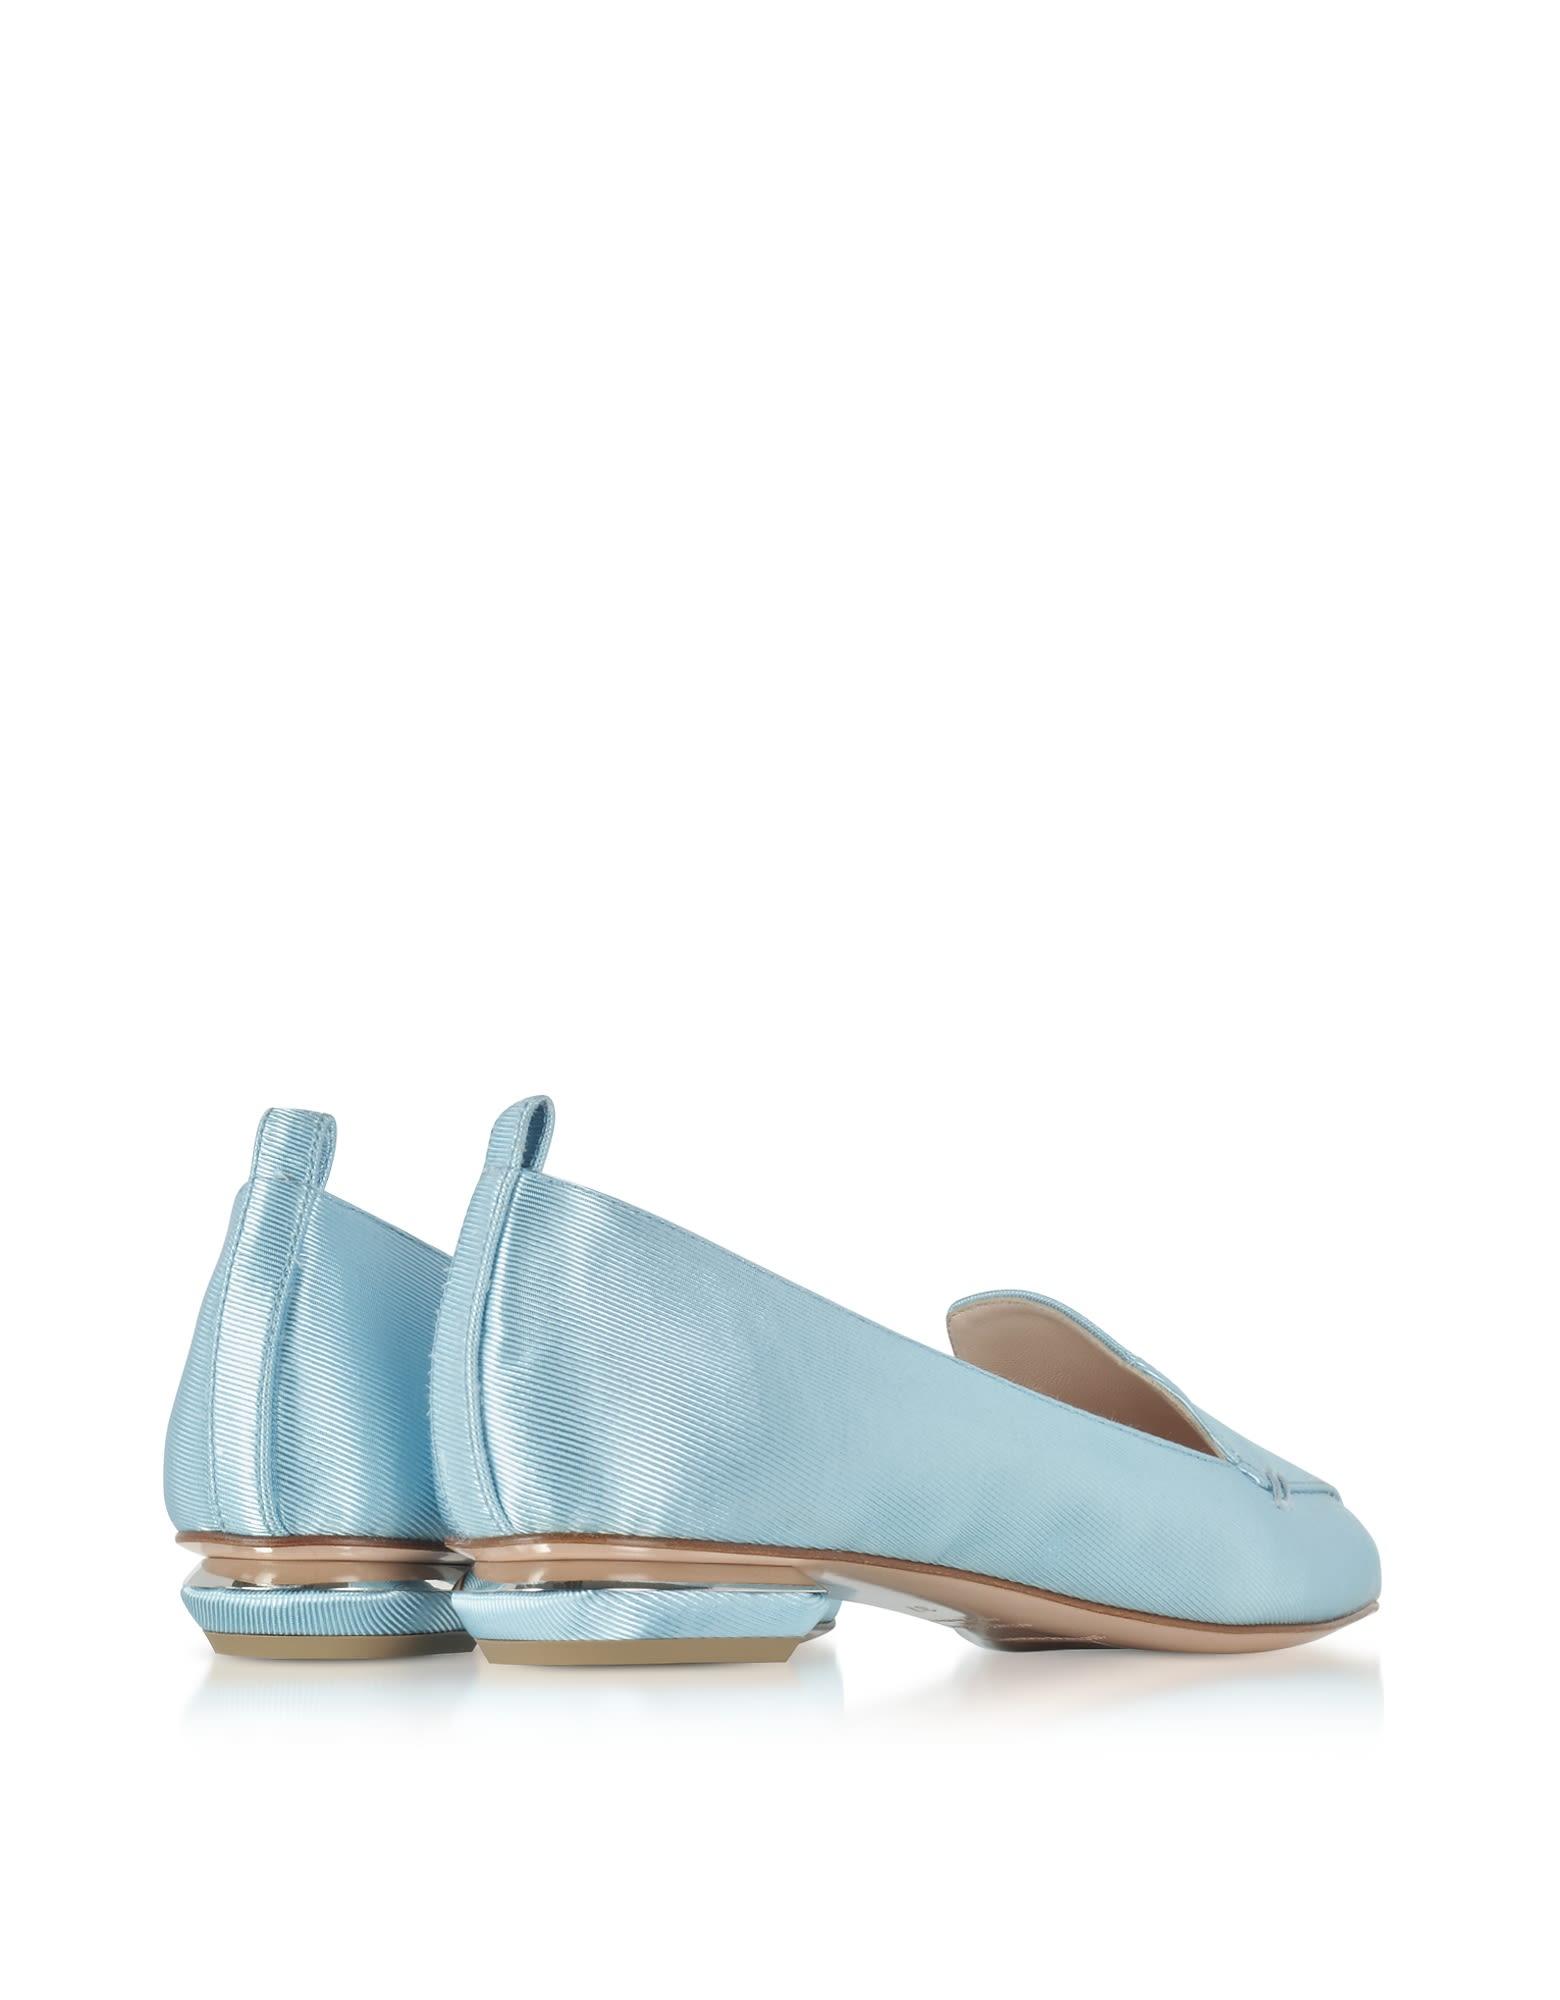 Nicholas Kirkwood Blue Satin Beya Loafers NLyblDz3vz